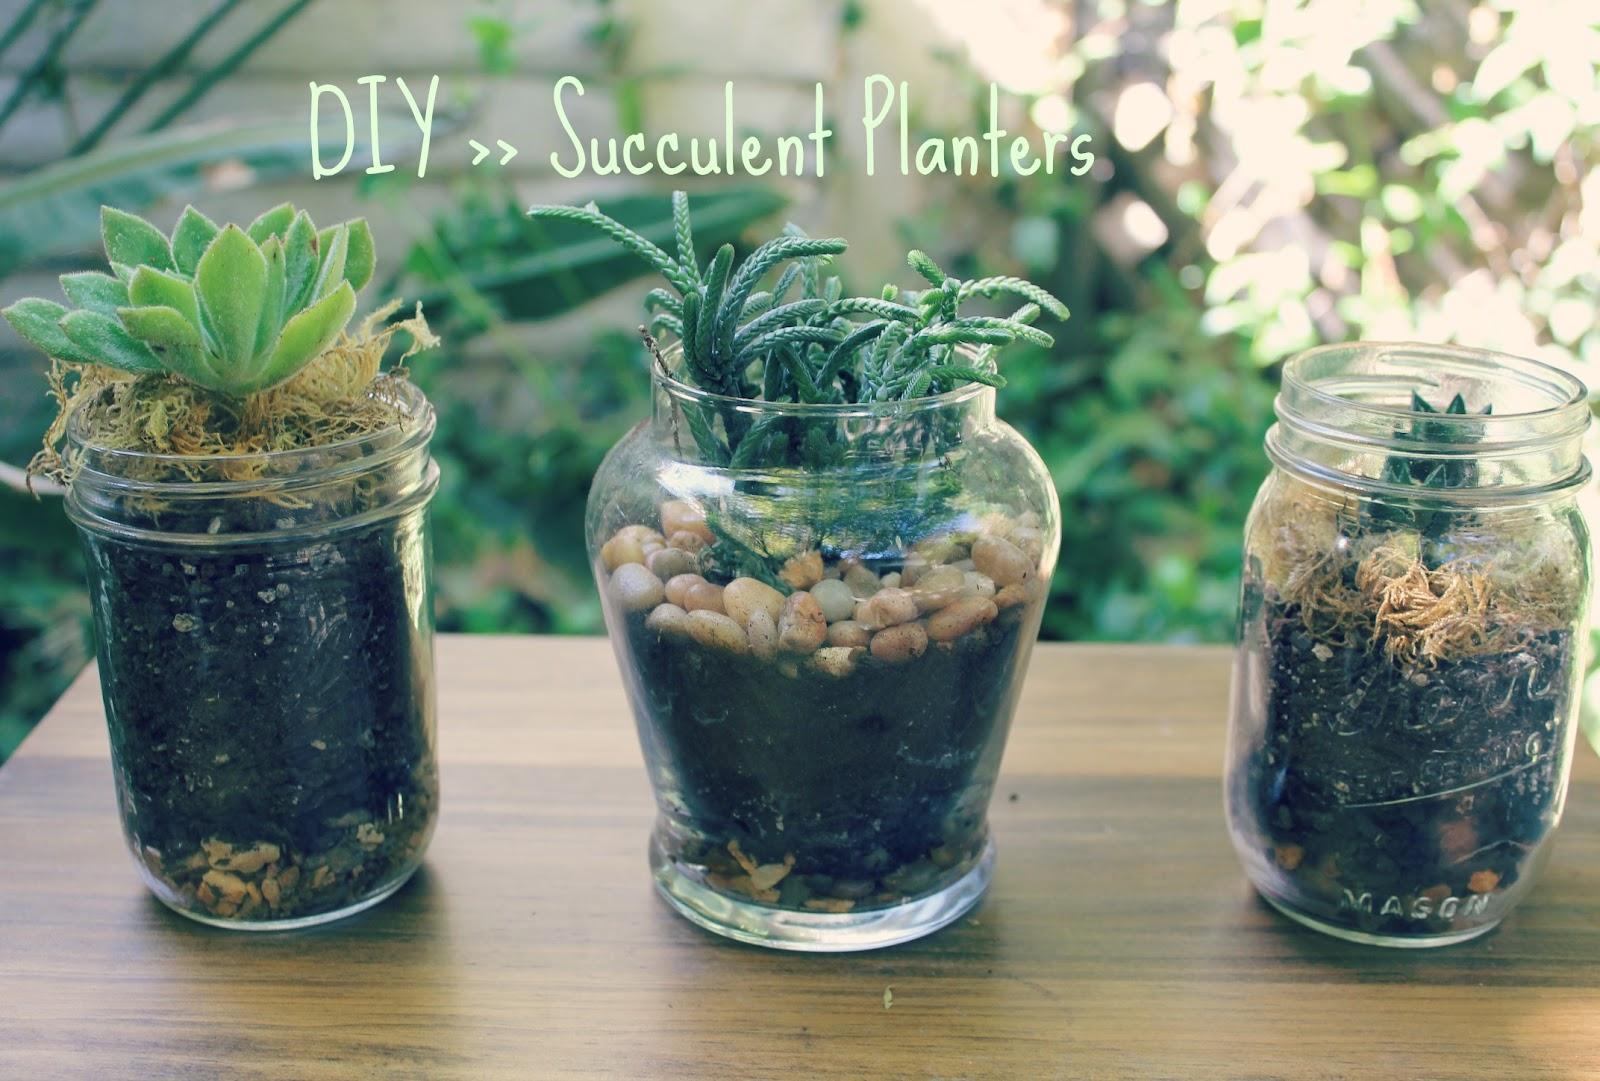 Abhaya diy succulent planters Planters for succulents